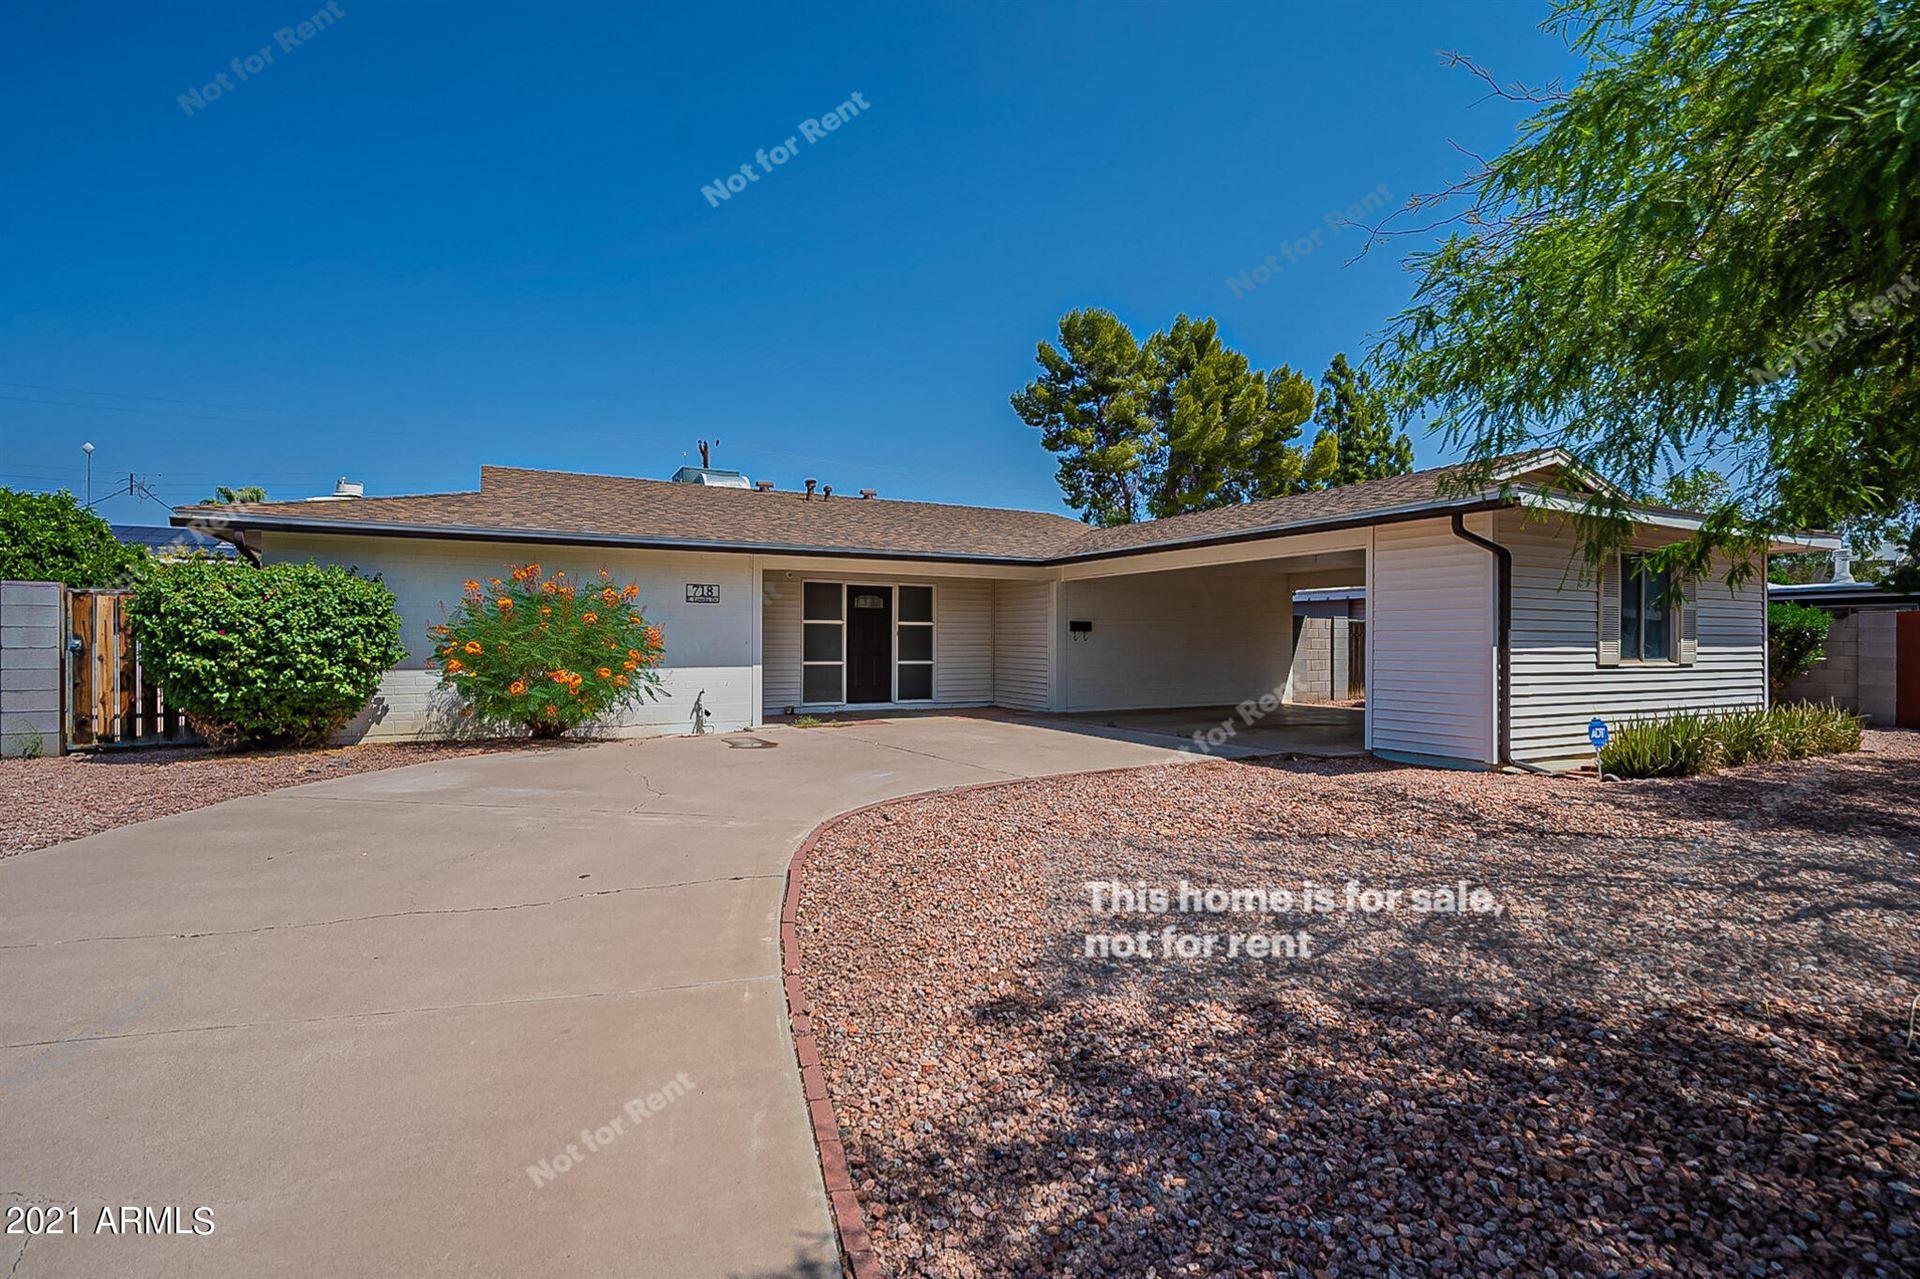 Photo of 718 E LOYOLA Drive, Tempe, AZ 85282 (MLS # 6295007)